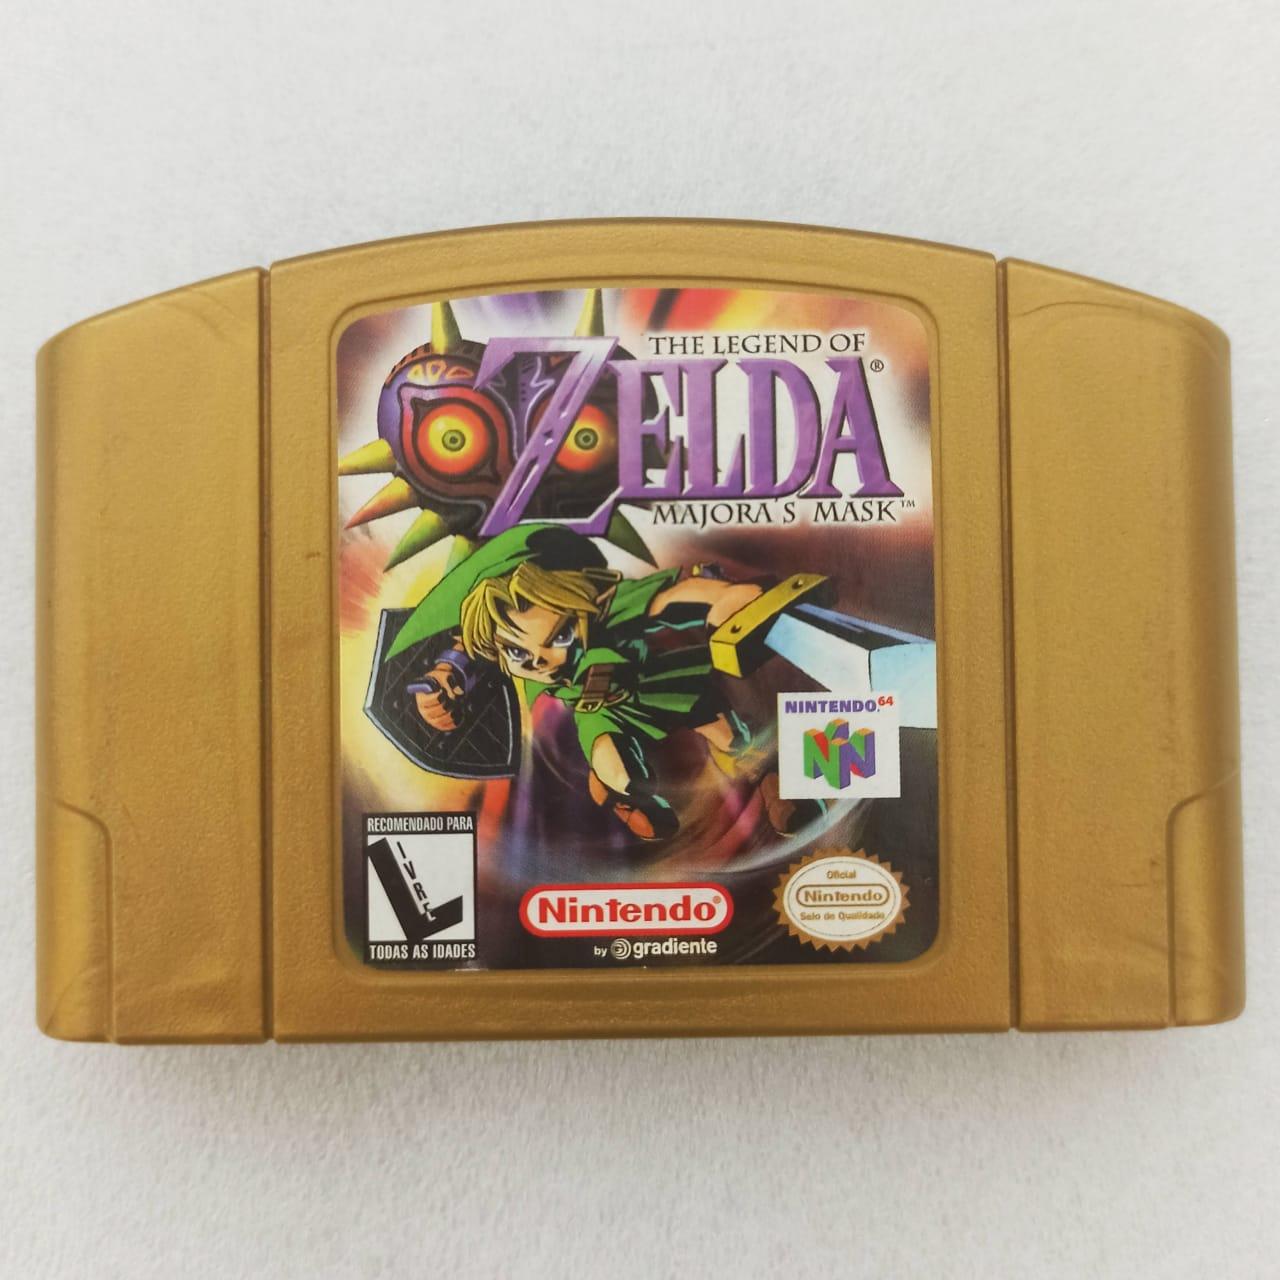 Zelda: Majora's Mask - USADO - Nintendo 64